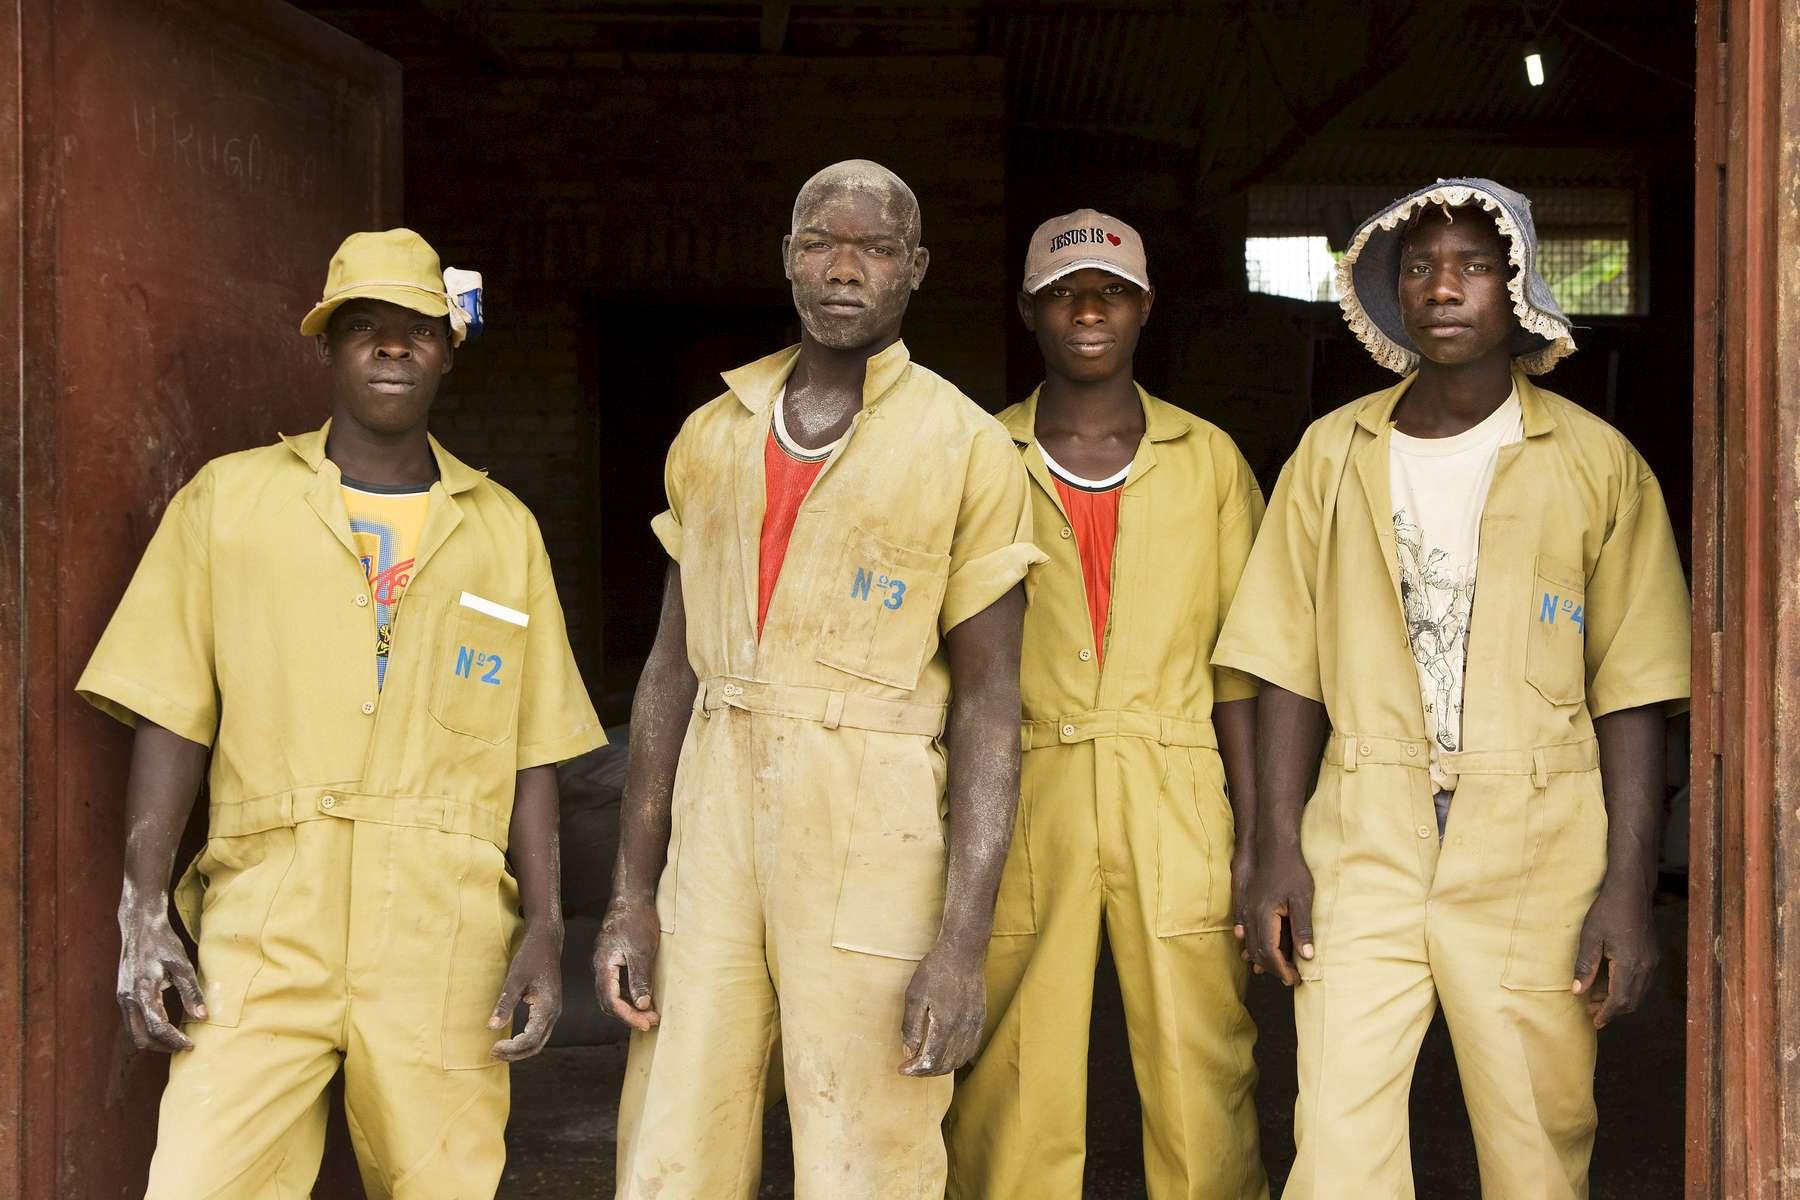 Corn mill workers, Nyaconga, Rwanda